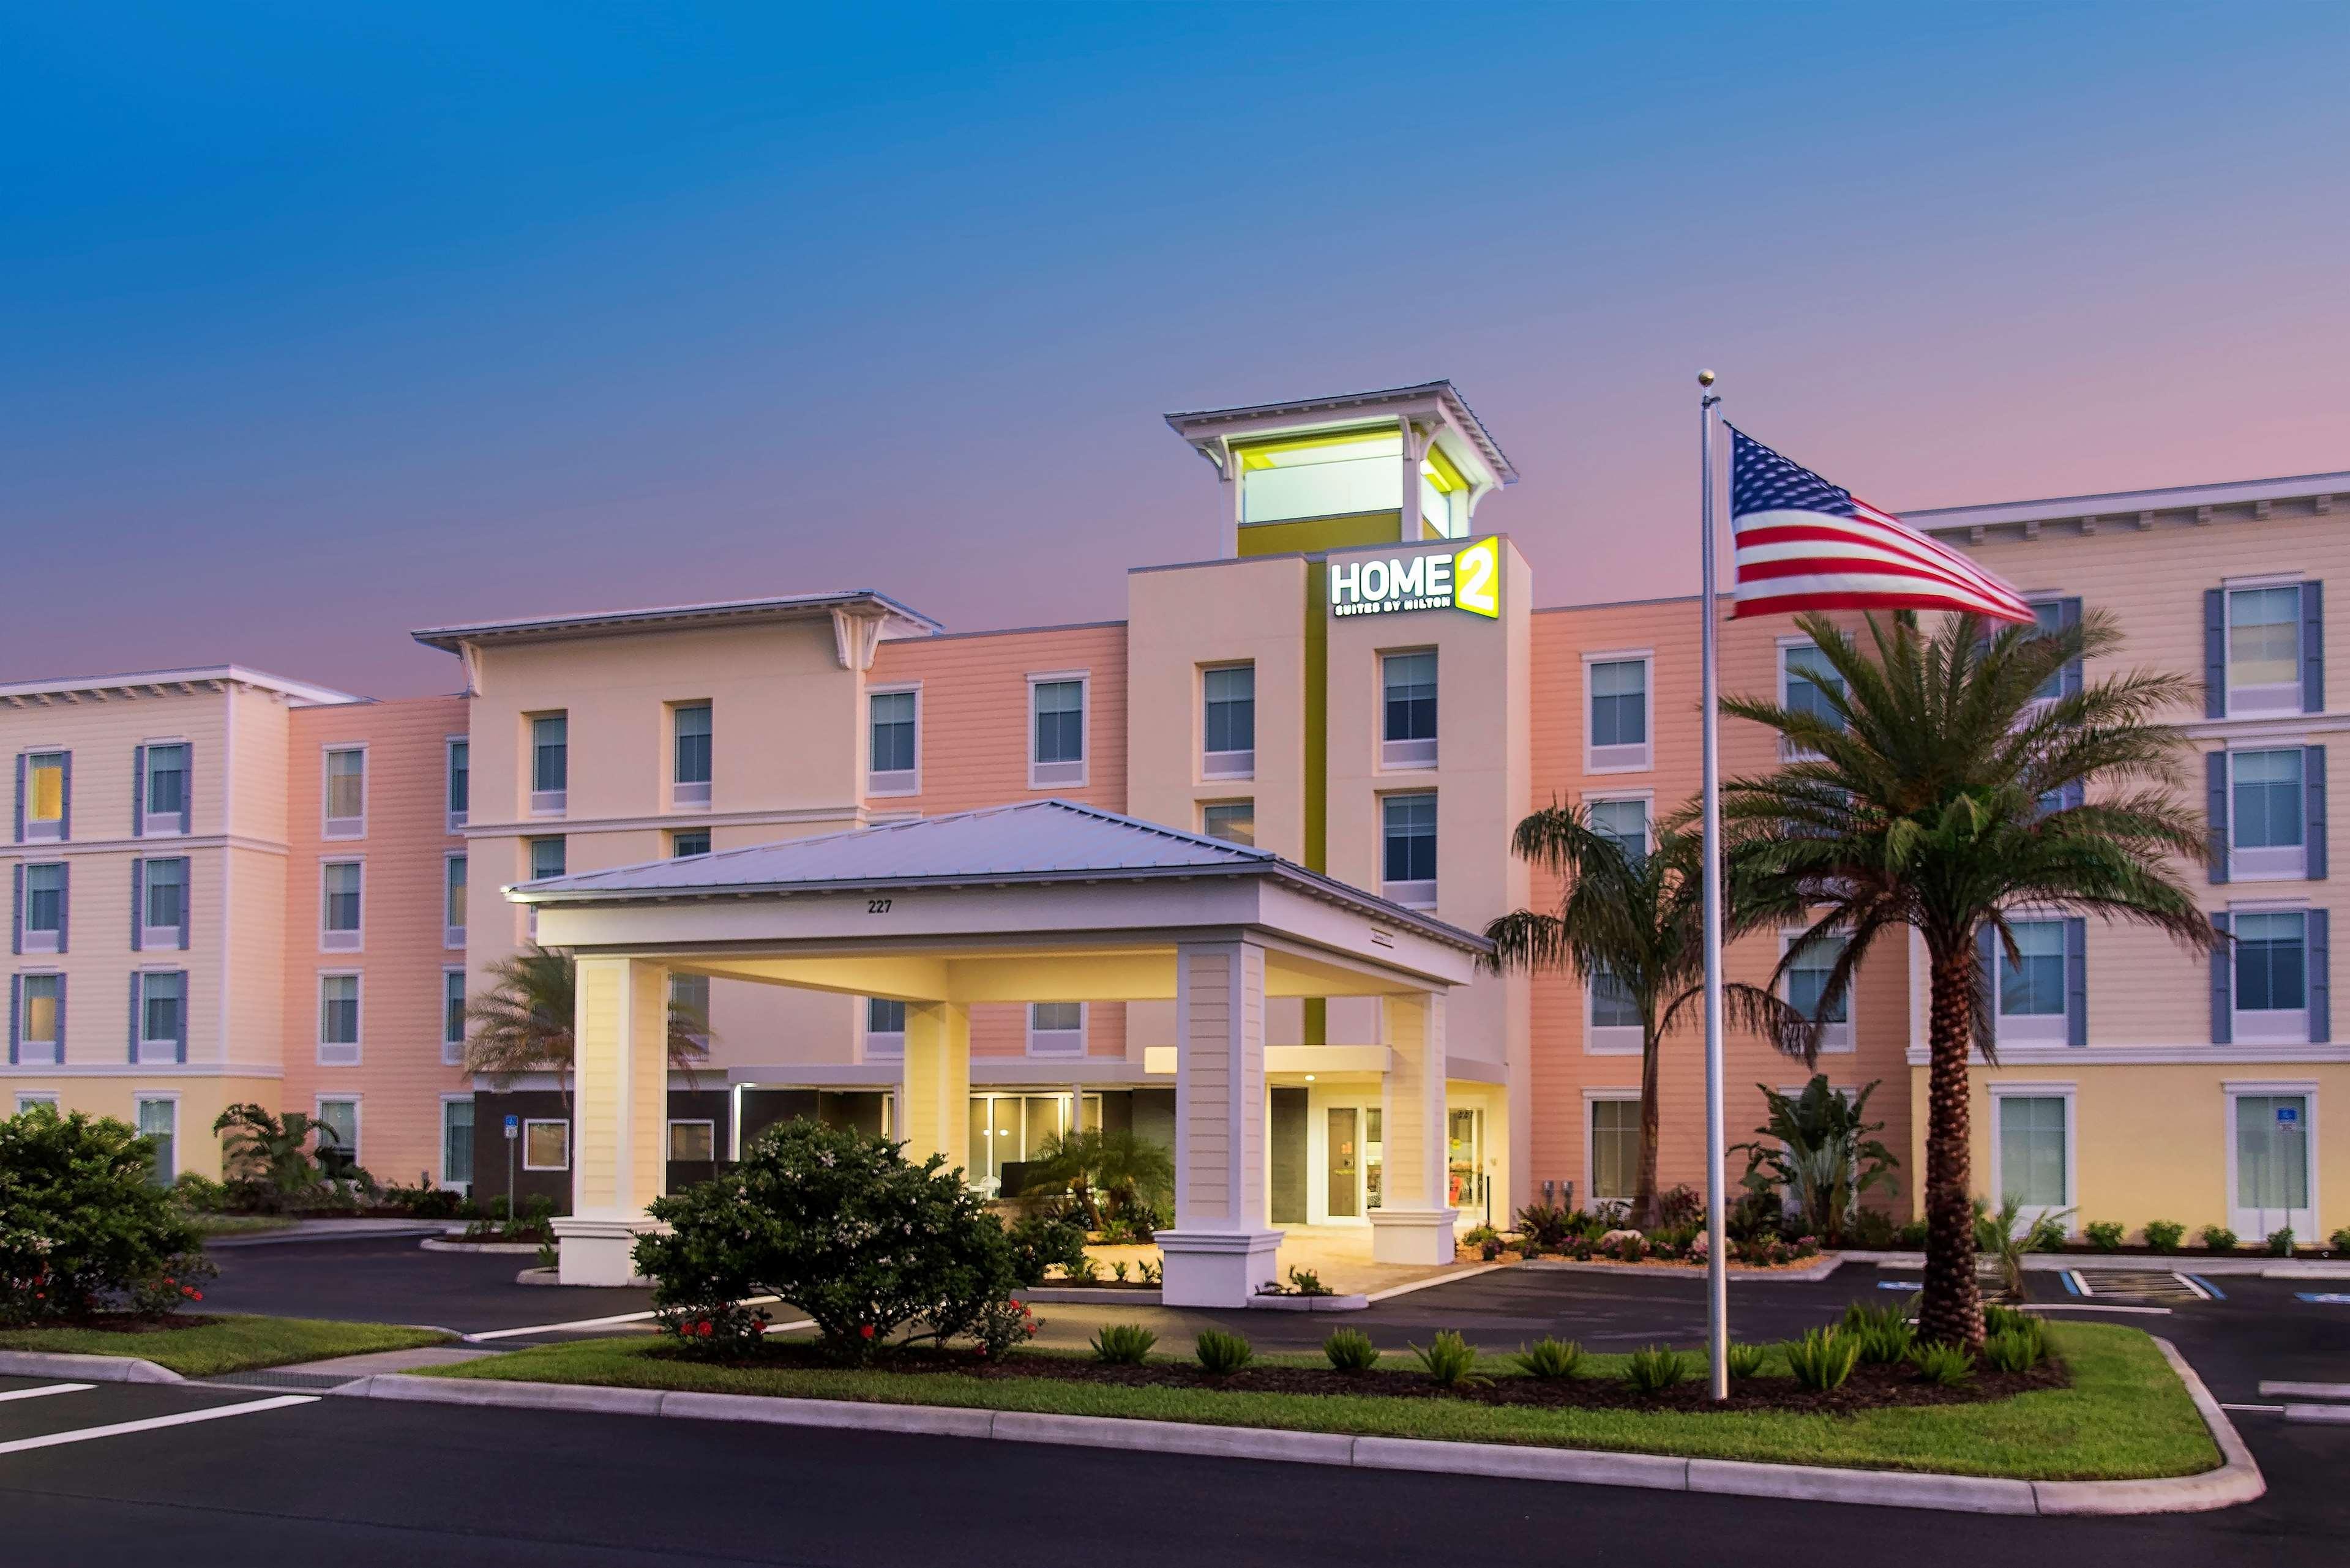 Home2 Suites by Hilton Nokomis Sarasota Casey Key image 2